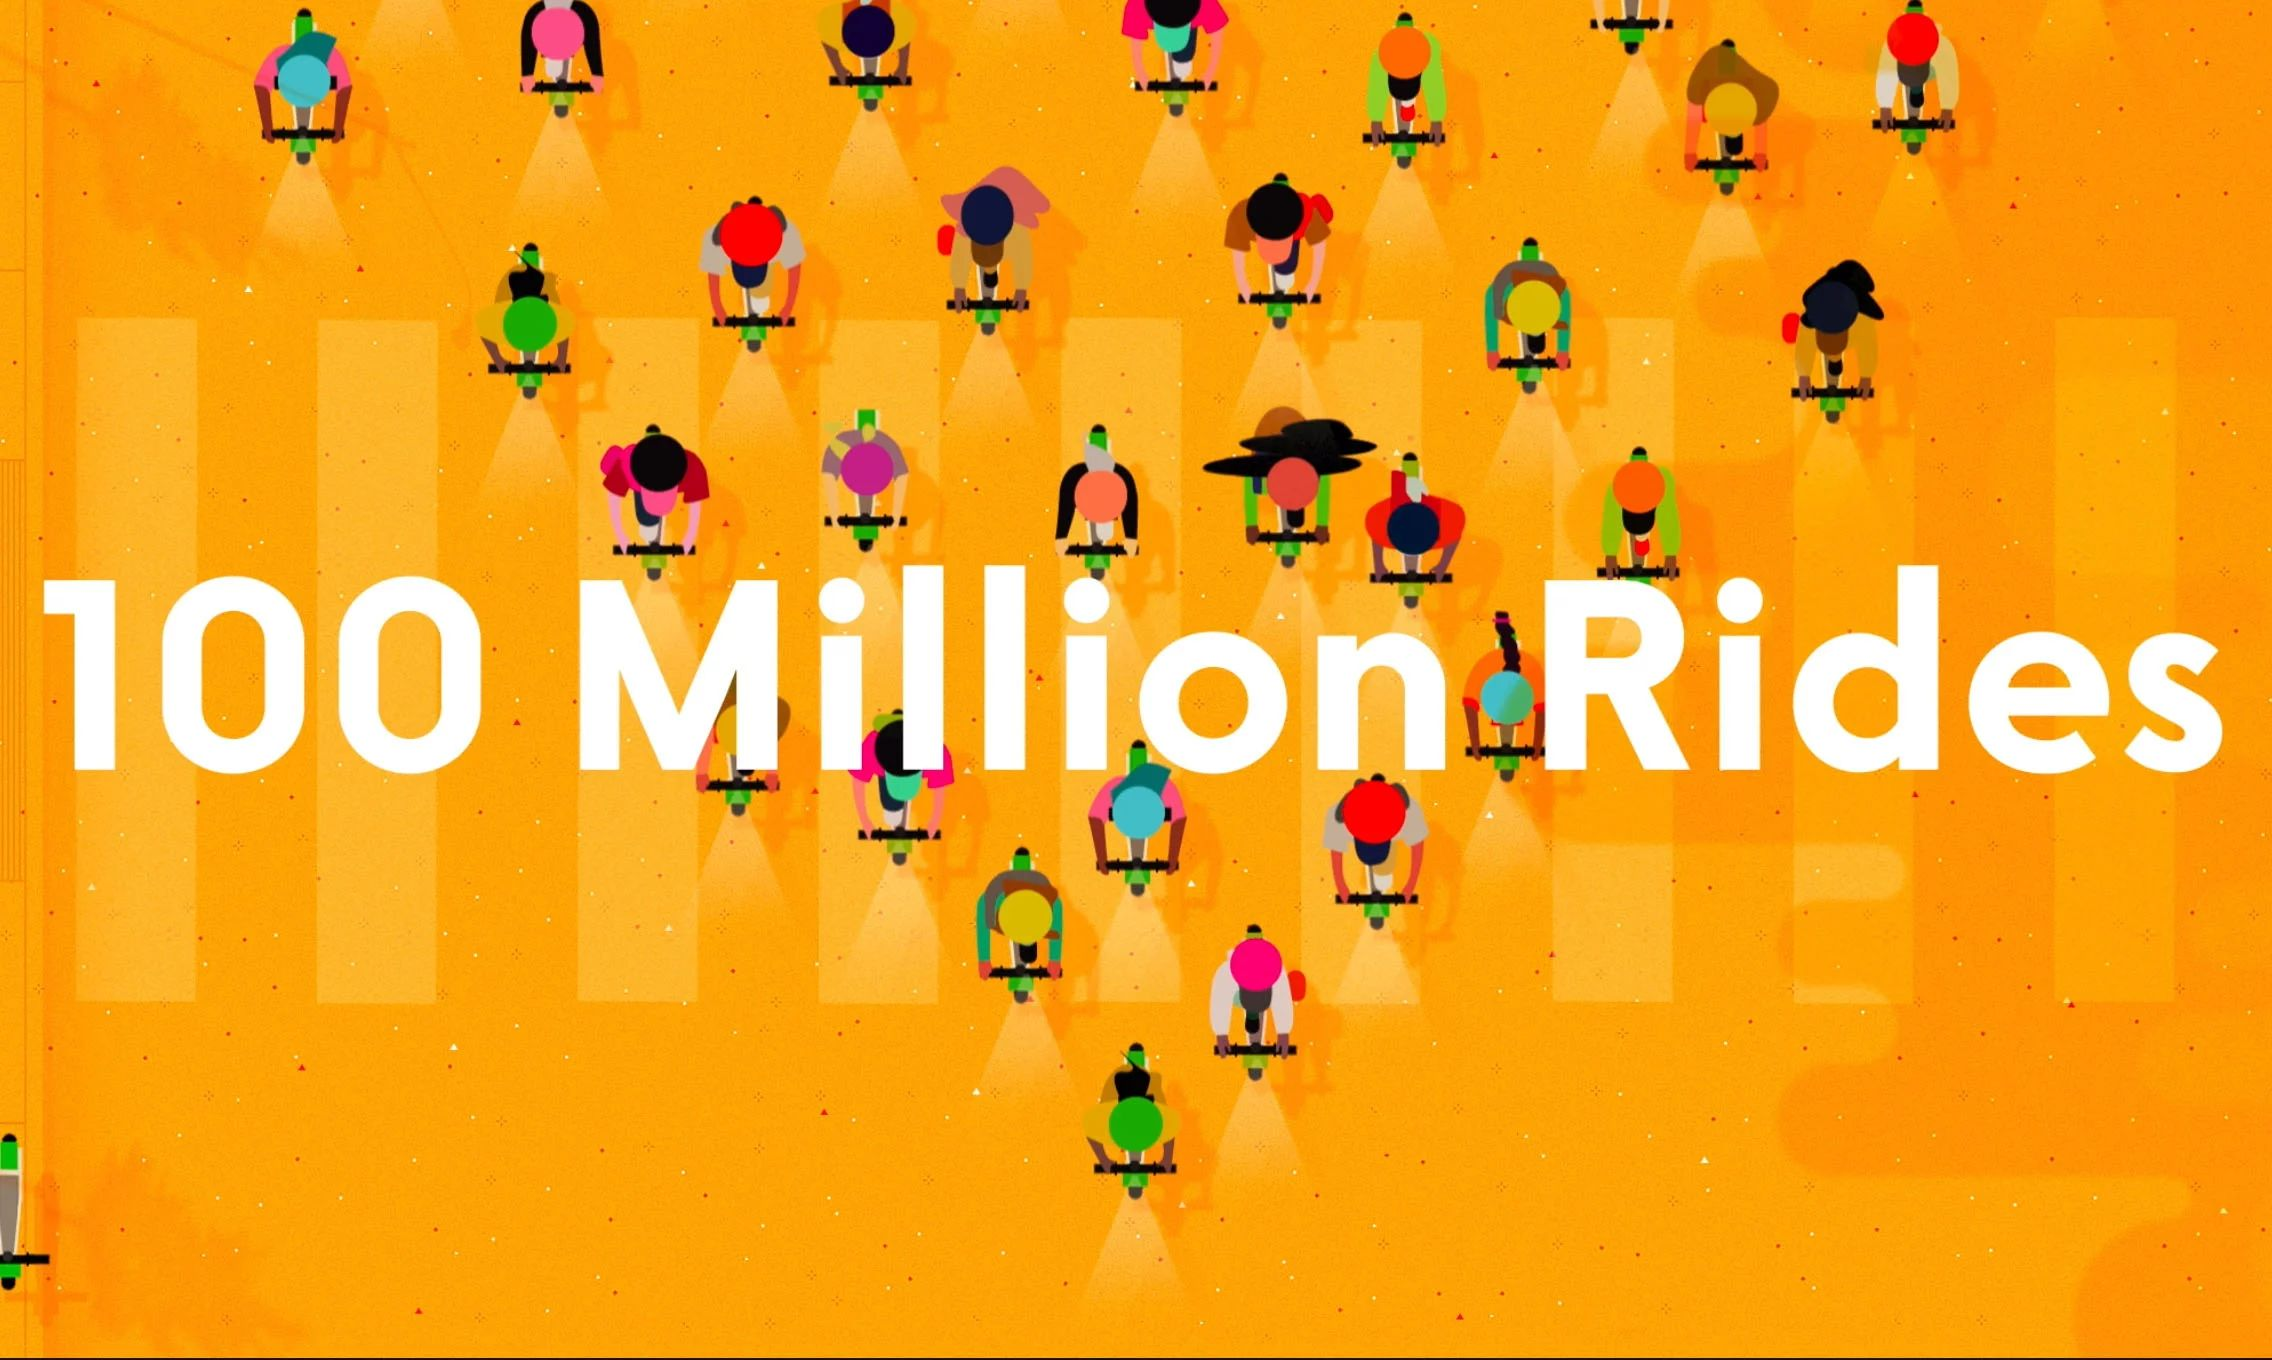 lime-100-million-rides